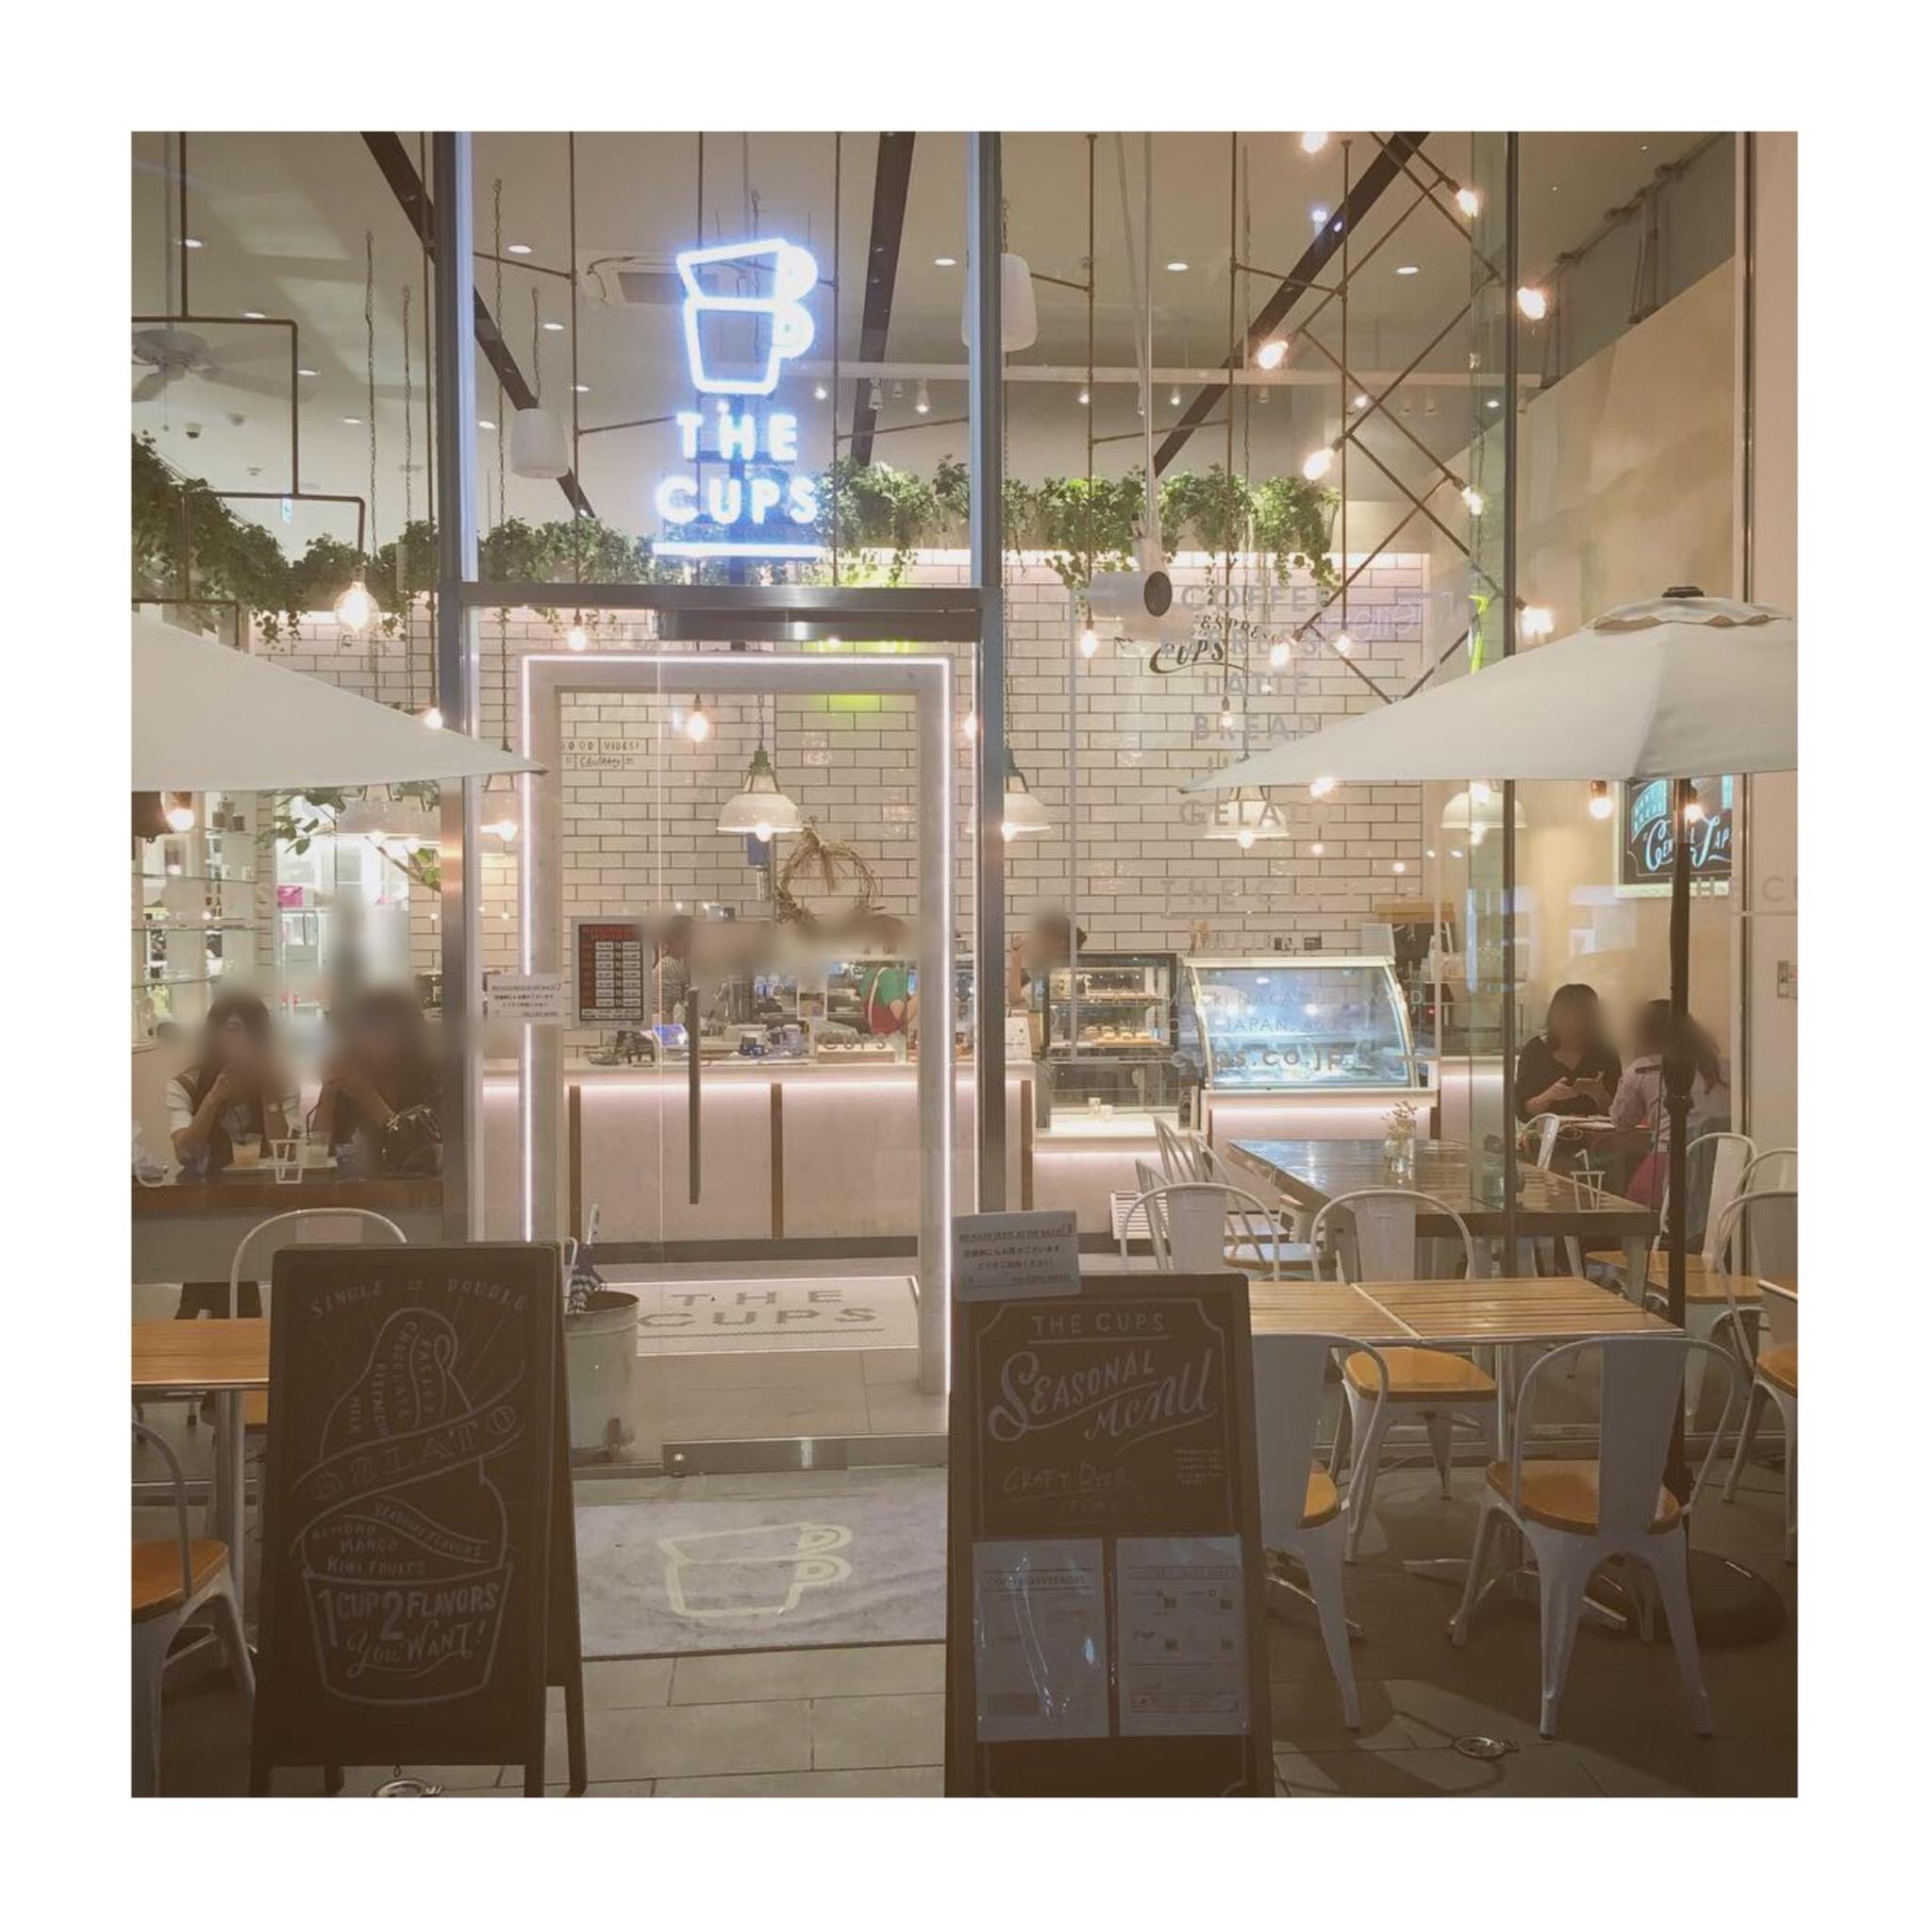 #13【#cafestagram】❤️:《名古屋》名駅すぐ前!のおしゃれカフェ『THE CUPS MEIEKI』☻_1